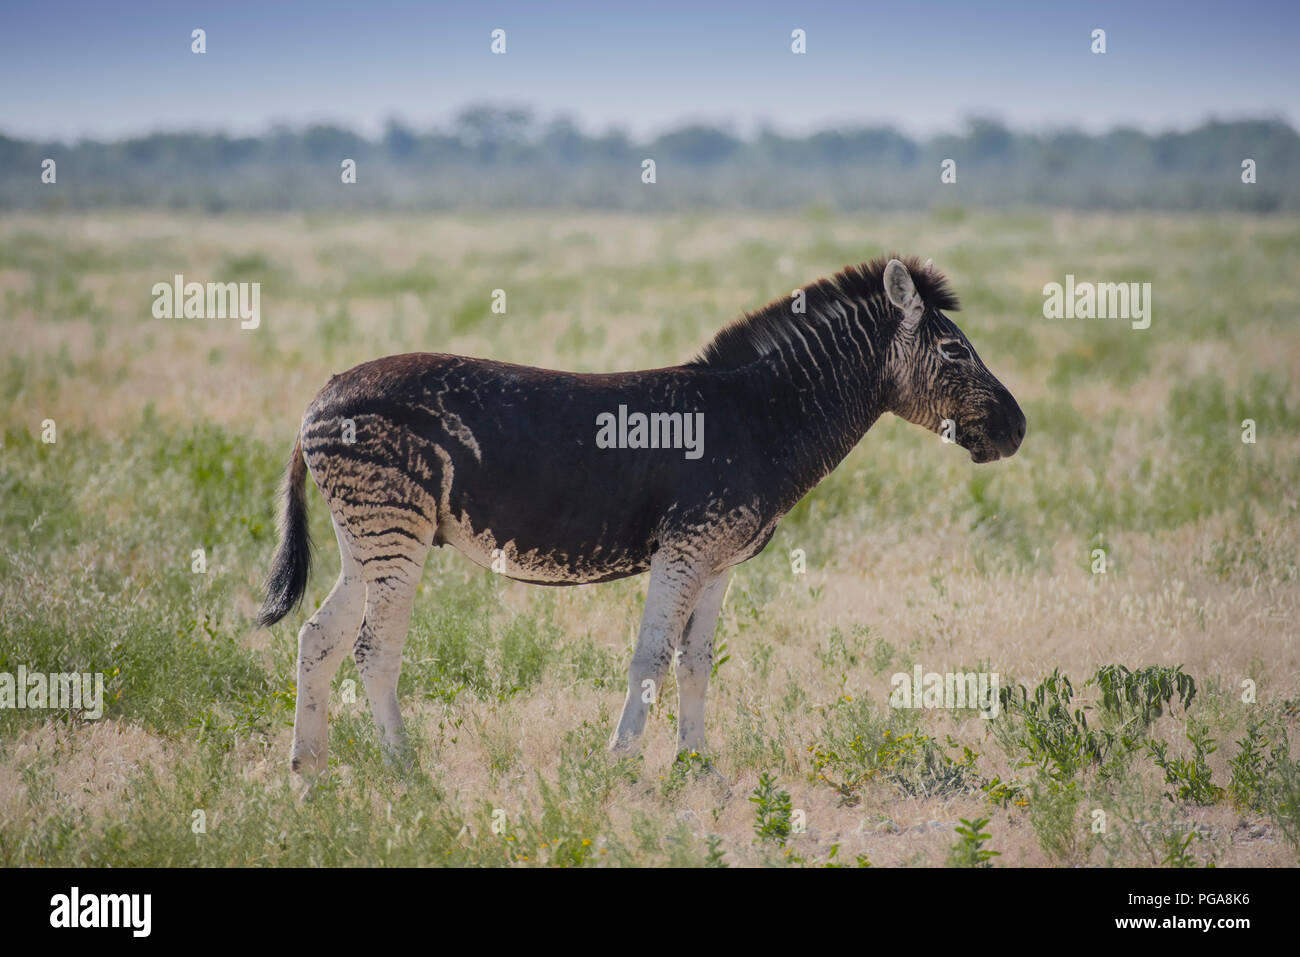 Burchell's Zebra (Equus quagga burchelli) with abnormal dark coat color, Etosha National Park, Namibia - Stock Image